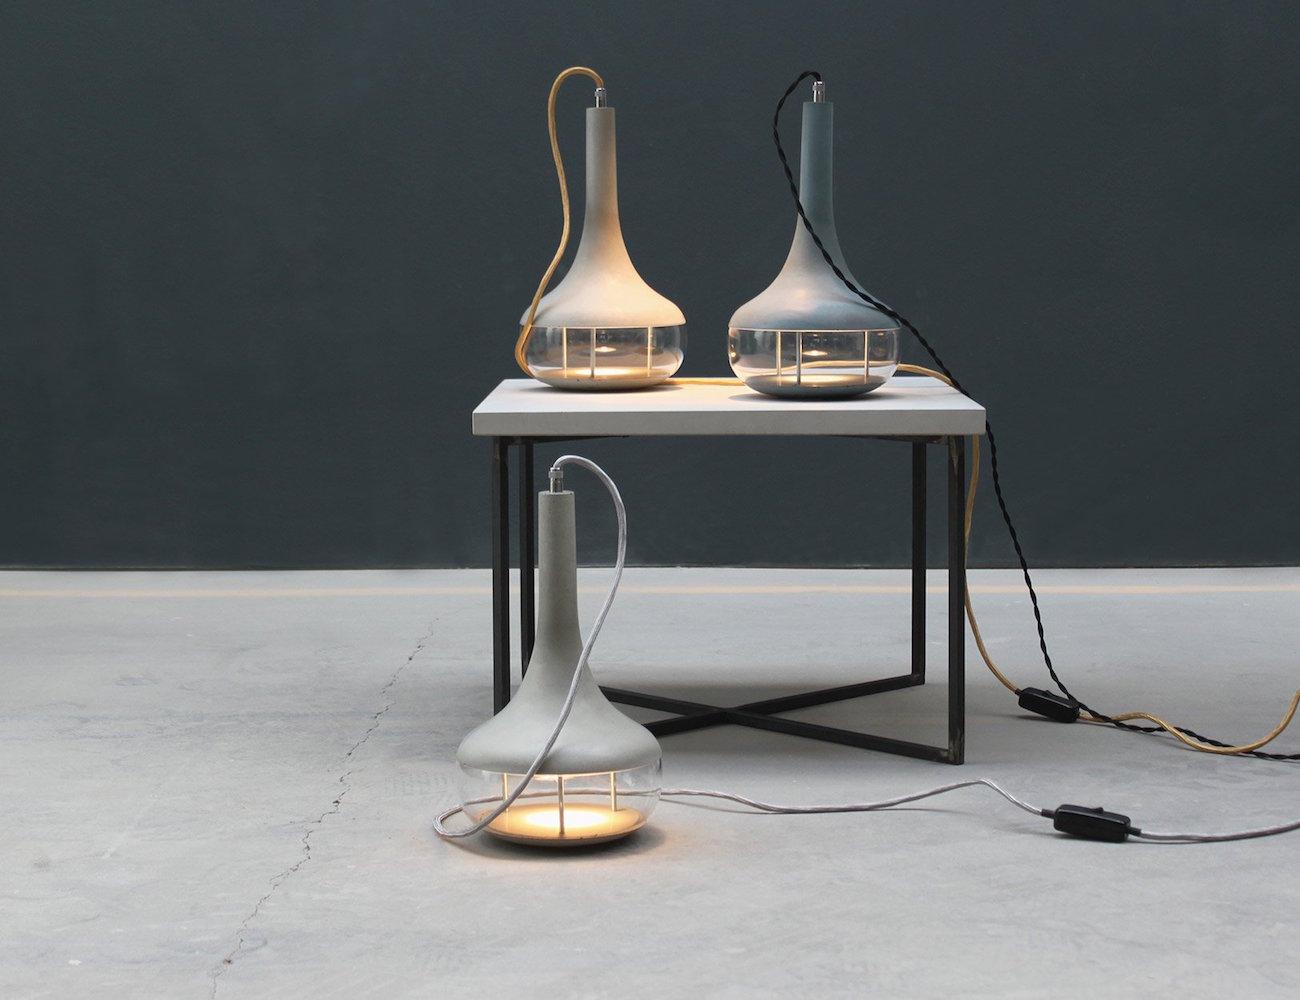 IdeAL Concrete Ceiling Lamp